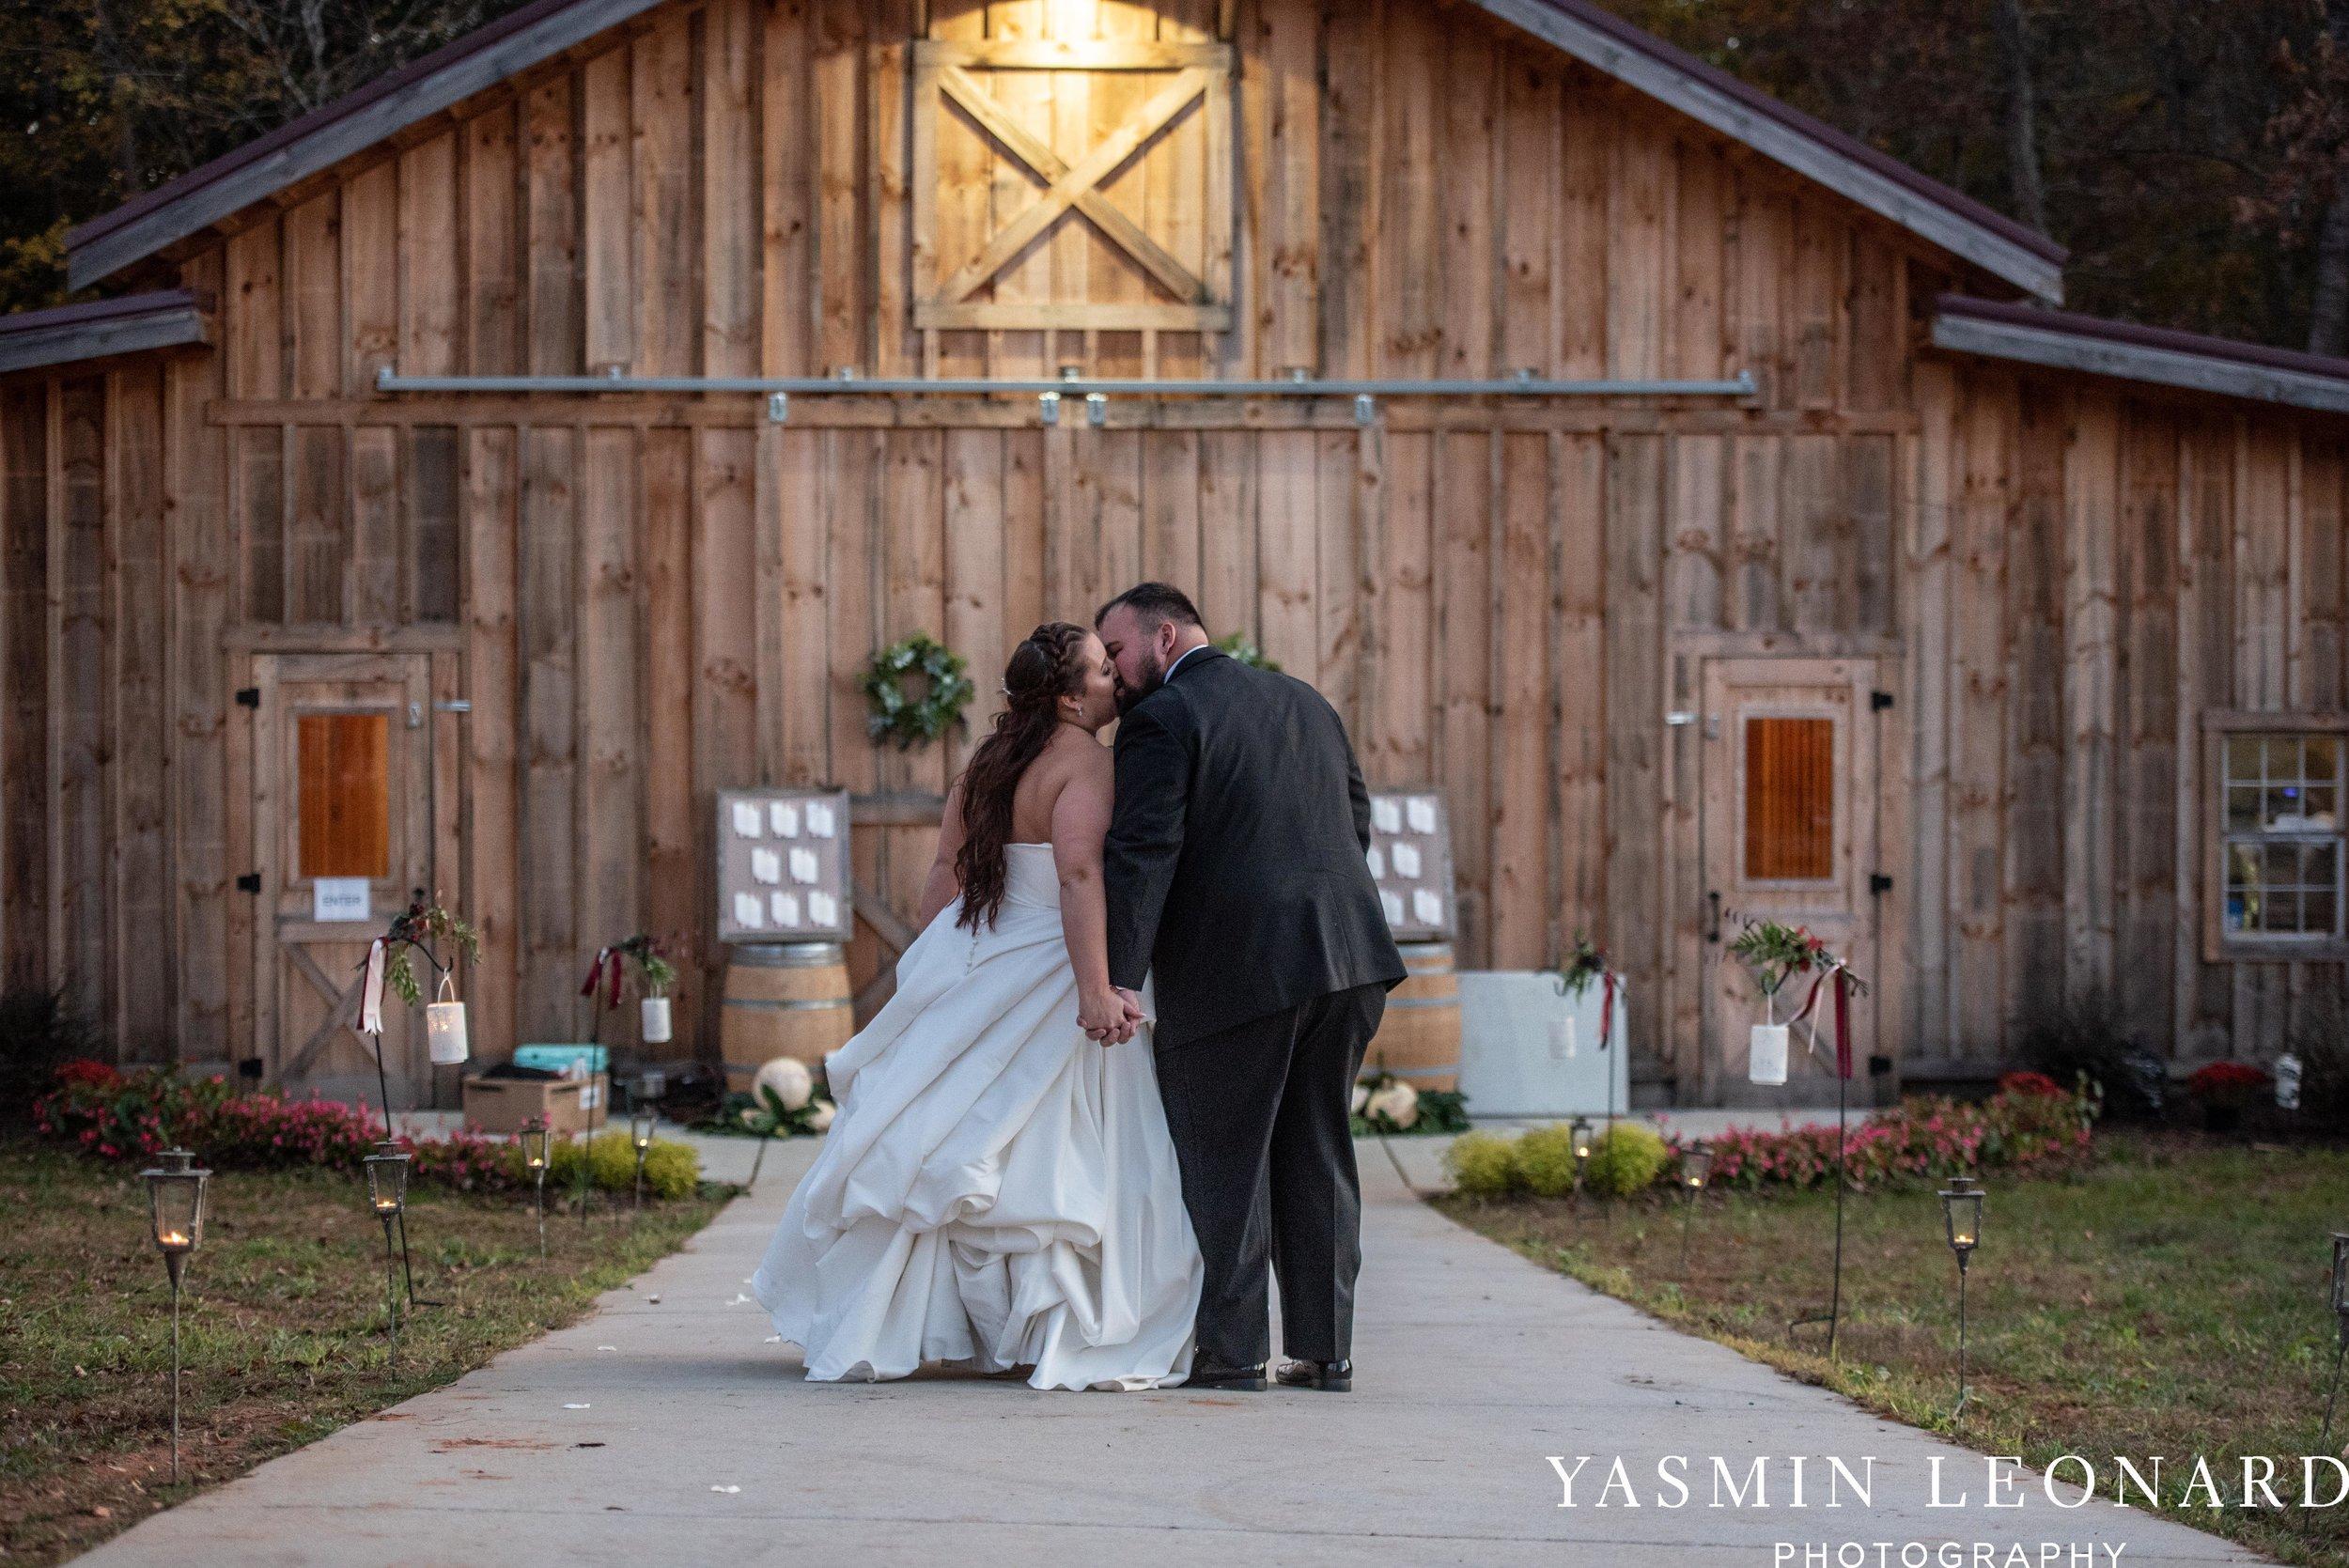 Wesley Memorial United Methodist Church - Old Homeplace Winery - High Point Weddings - High Point Wedding Photographer - NC Weddings - NC Barn Venue - Yasmin Leonard Photography-66.jpg